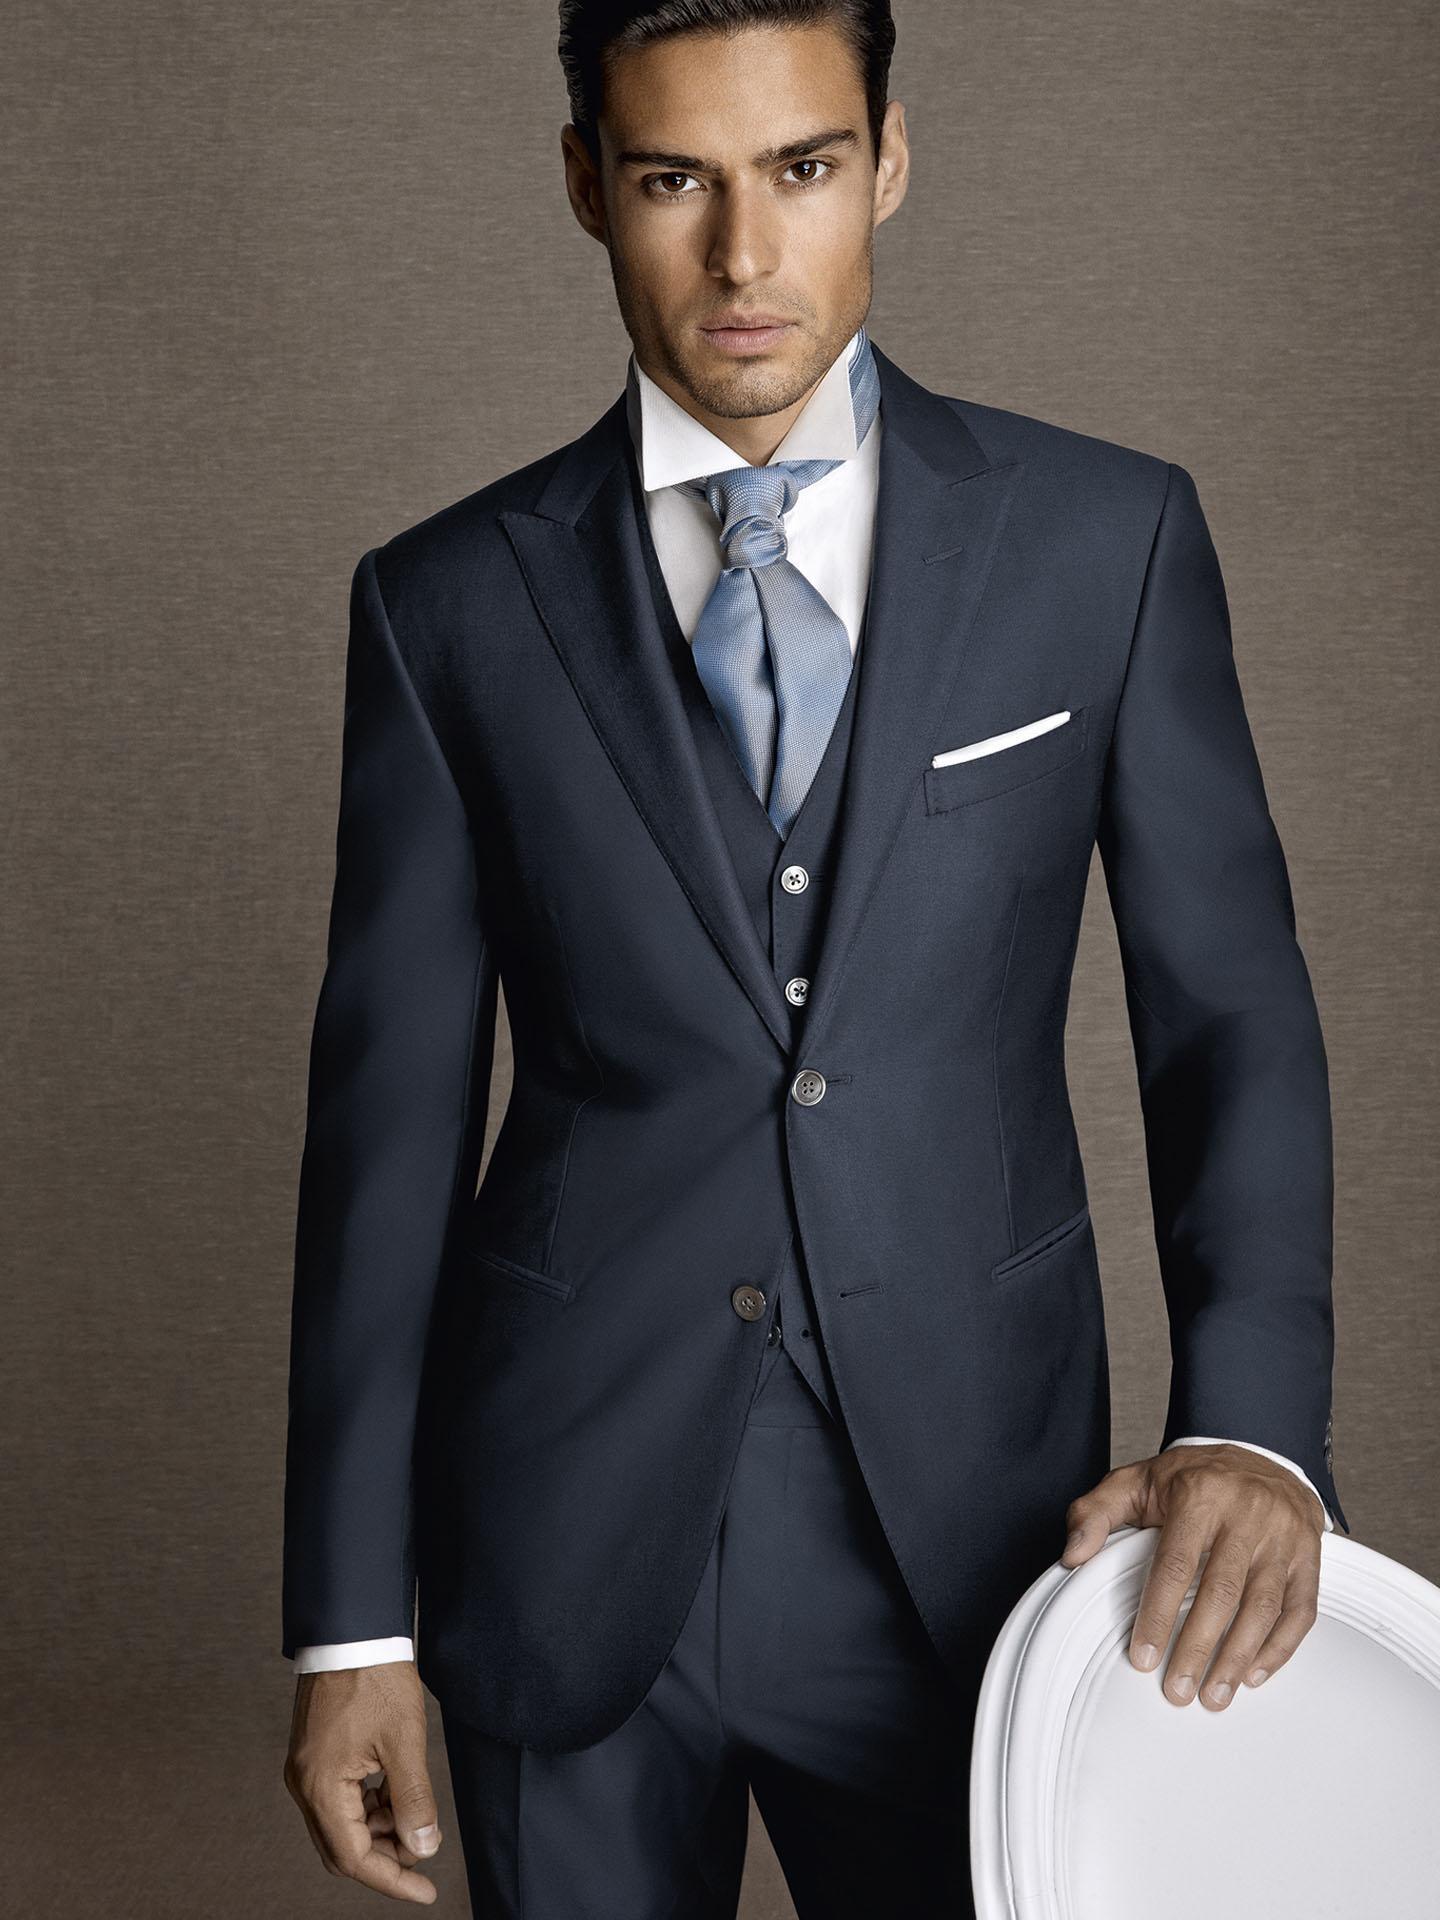 Navy Blue Mentuxedos Wedding Suits For Men Peaked Lapel Groomsmen ...